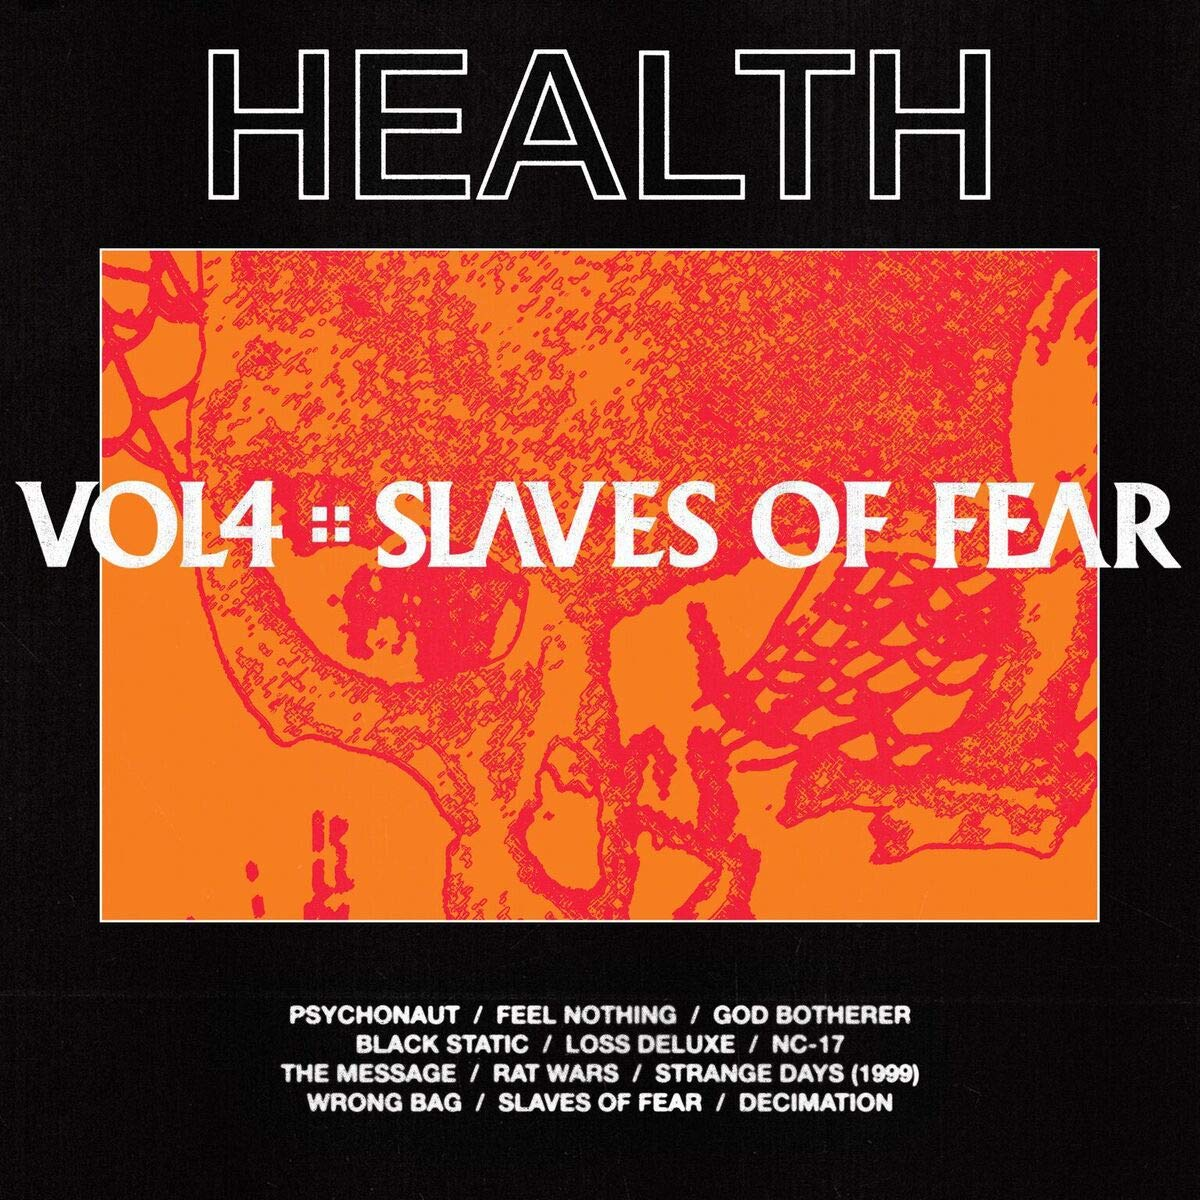 Vinilo : HEALTH - Vol, 4: Slaves Of Fear (LP Vinyl)